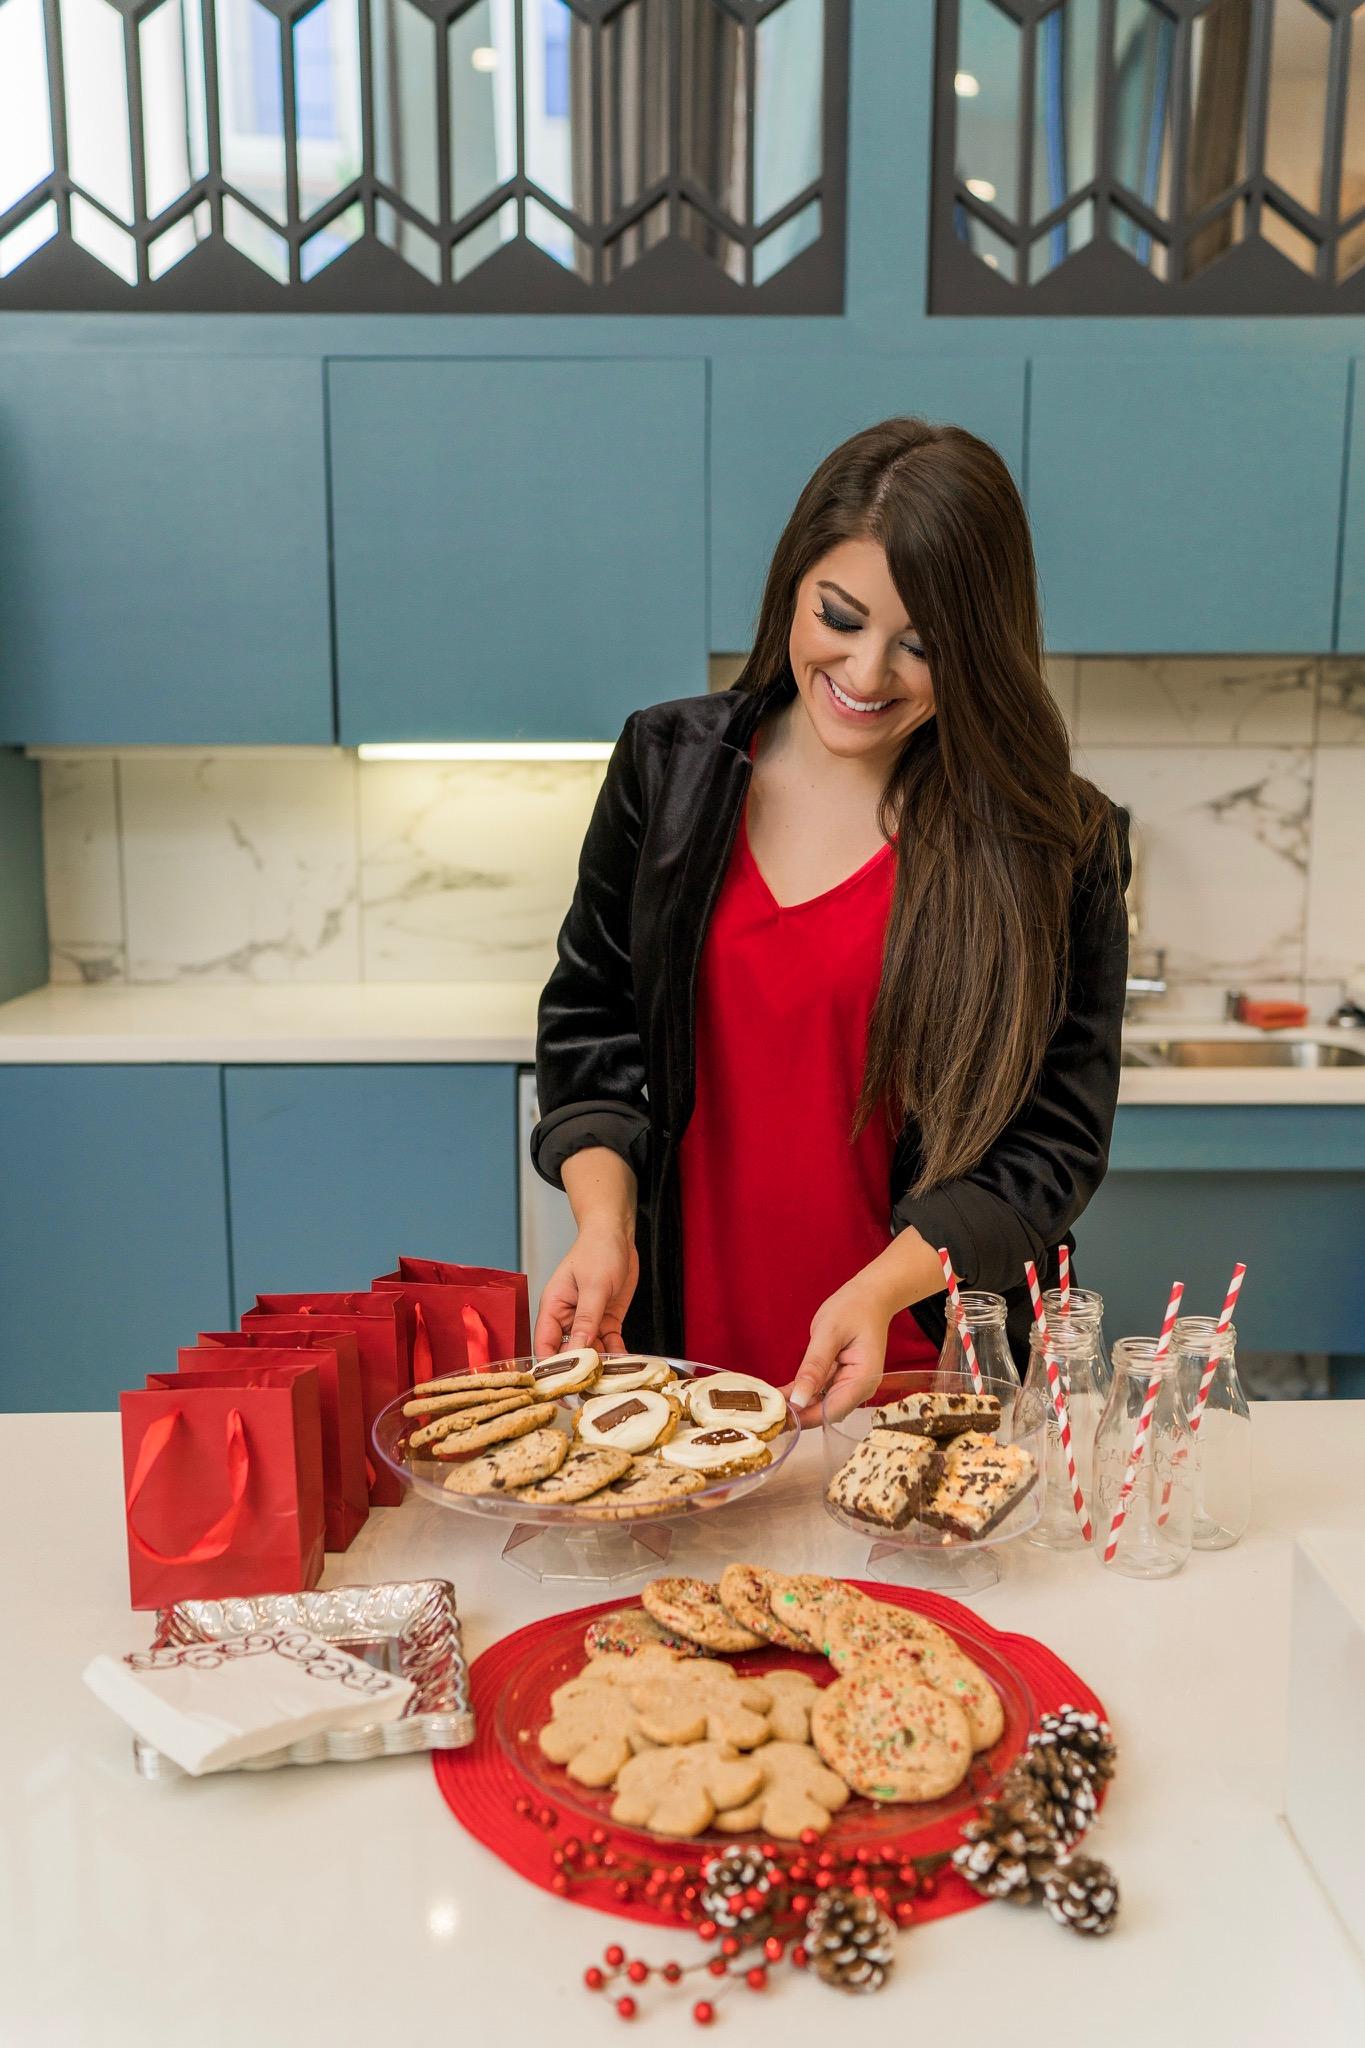 Cheryl's Cookies - Beyond Casual B